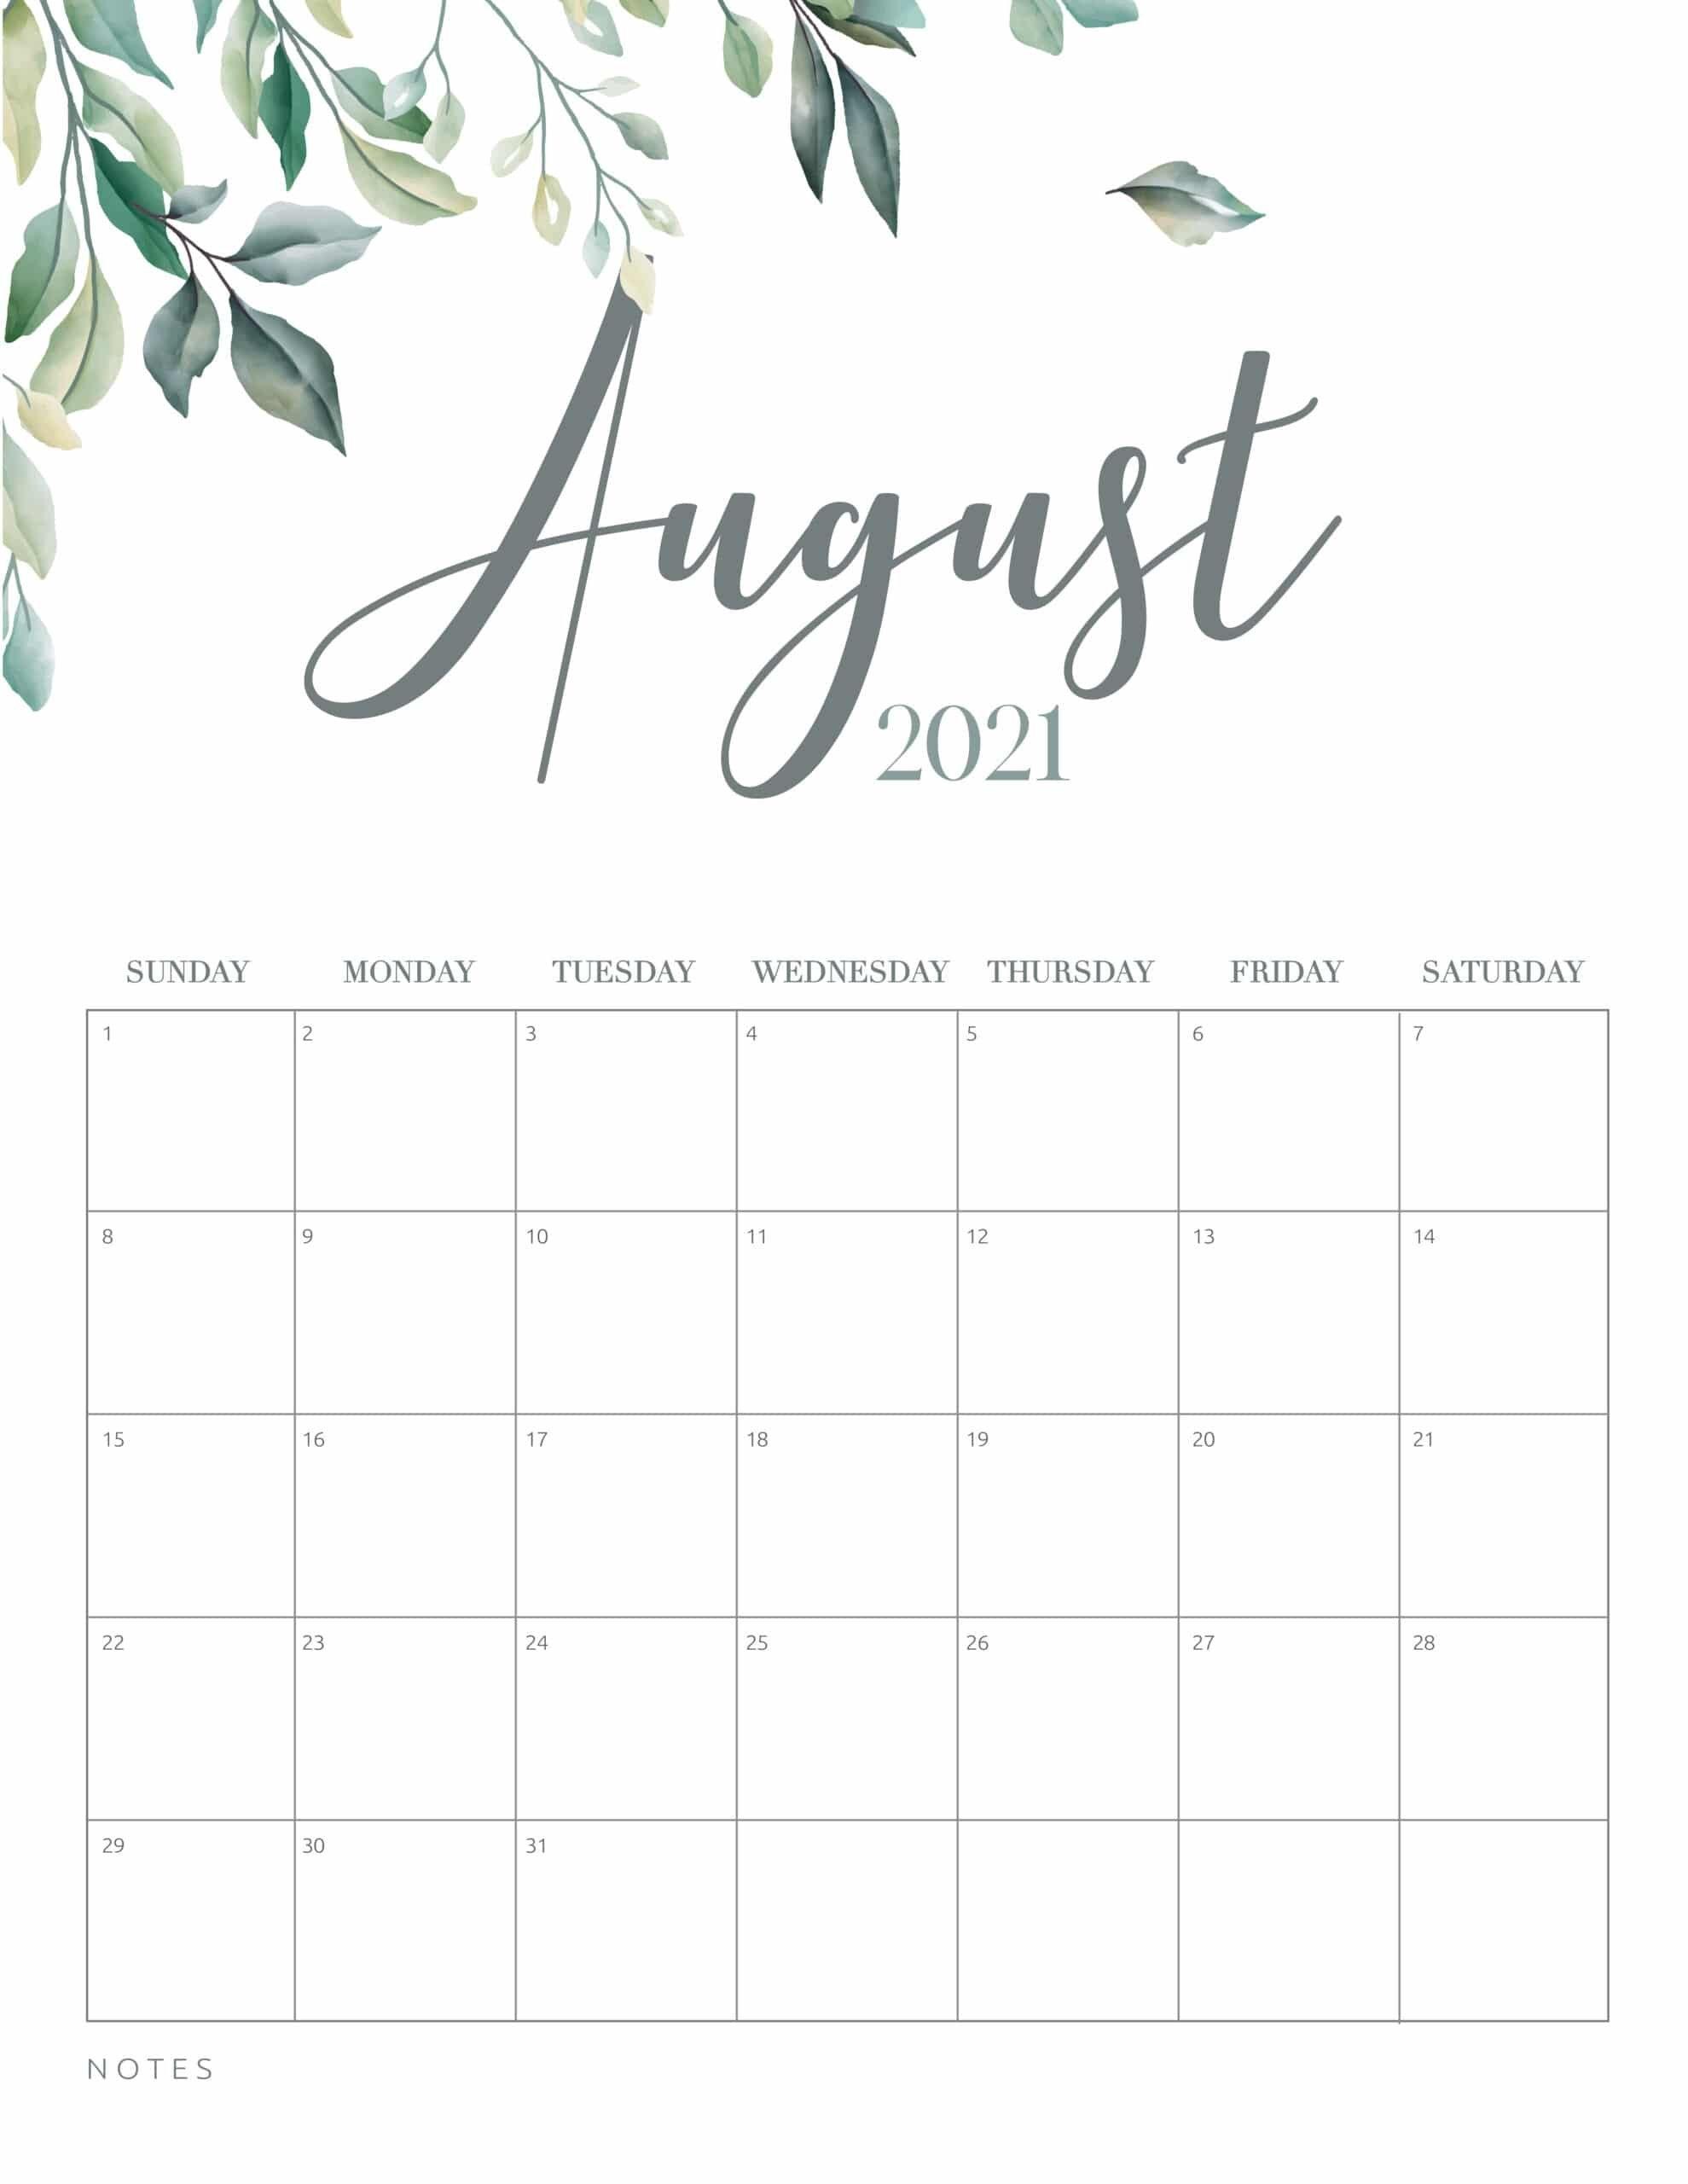 Free Printable 2021 Calendar Botanical Style - World Of Printables within Free Printable Calendar 2021